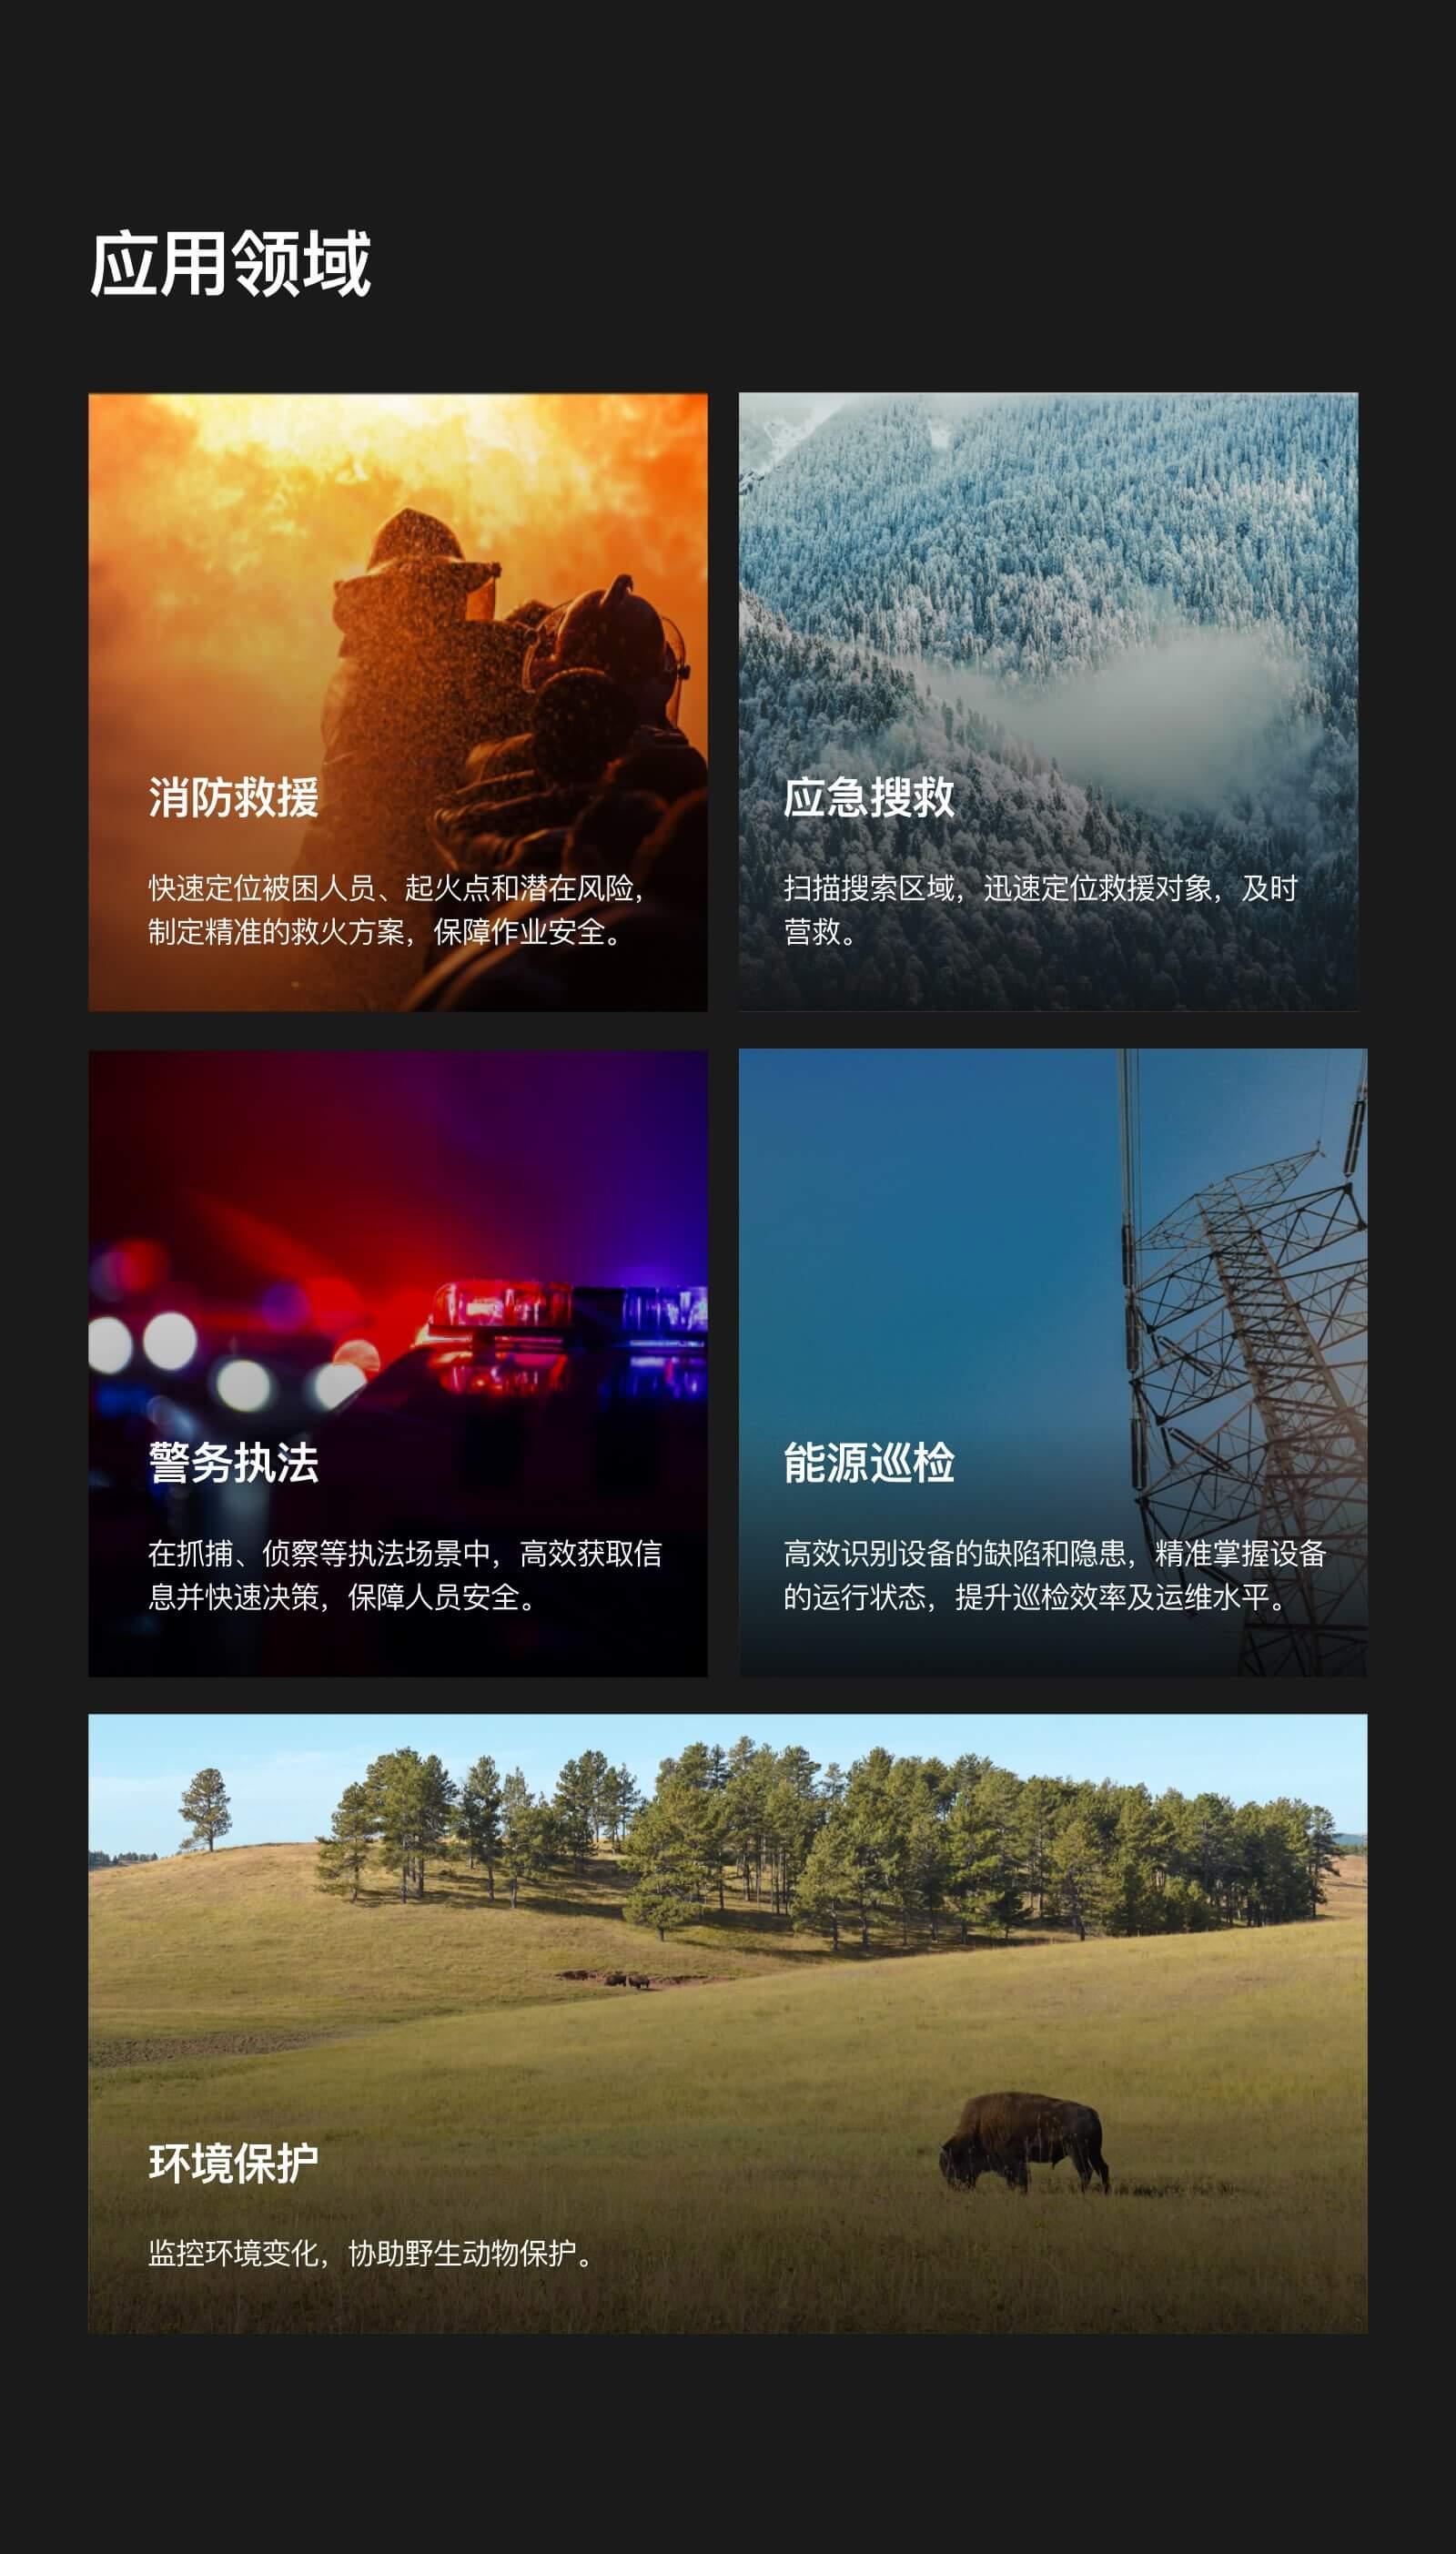 M2EA_PC%20_cn_13.jpg